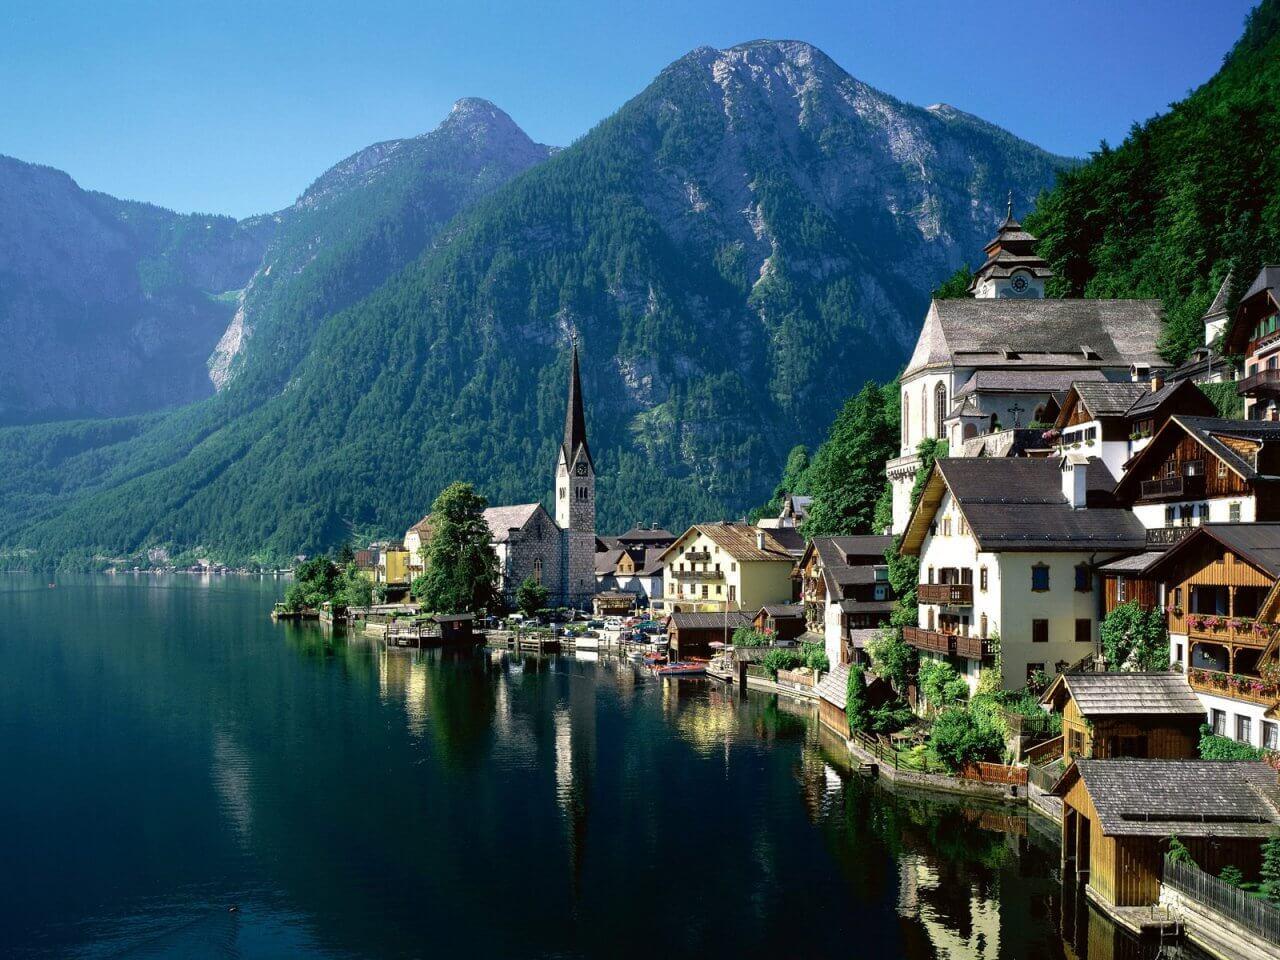 Sankt Wolfgang am Wolfgangsee - Immer eine Tagesreise wert